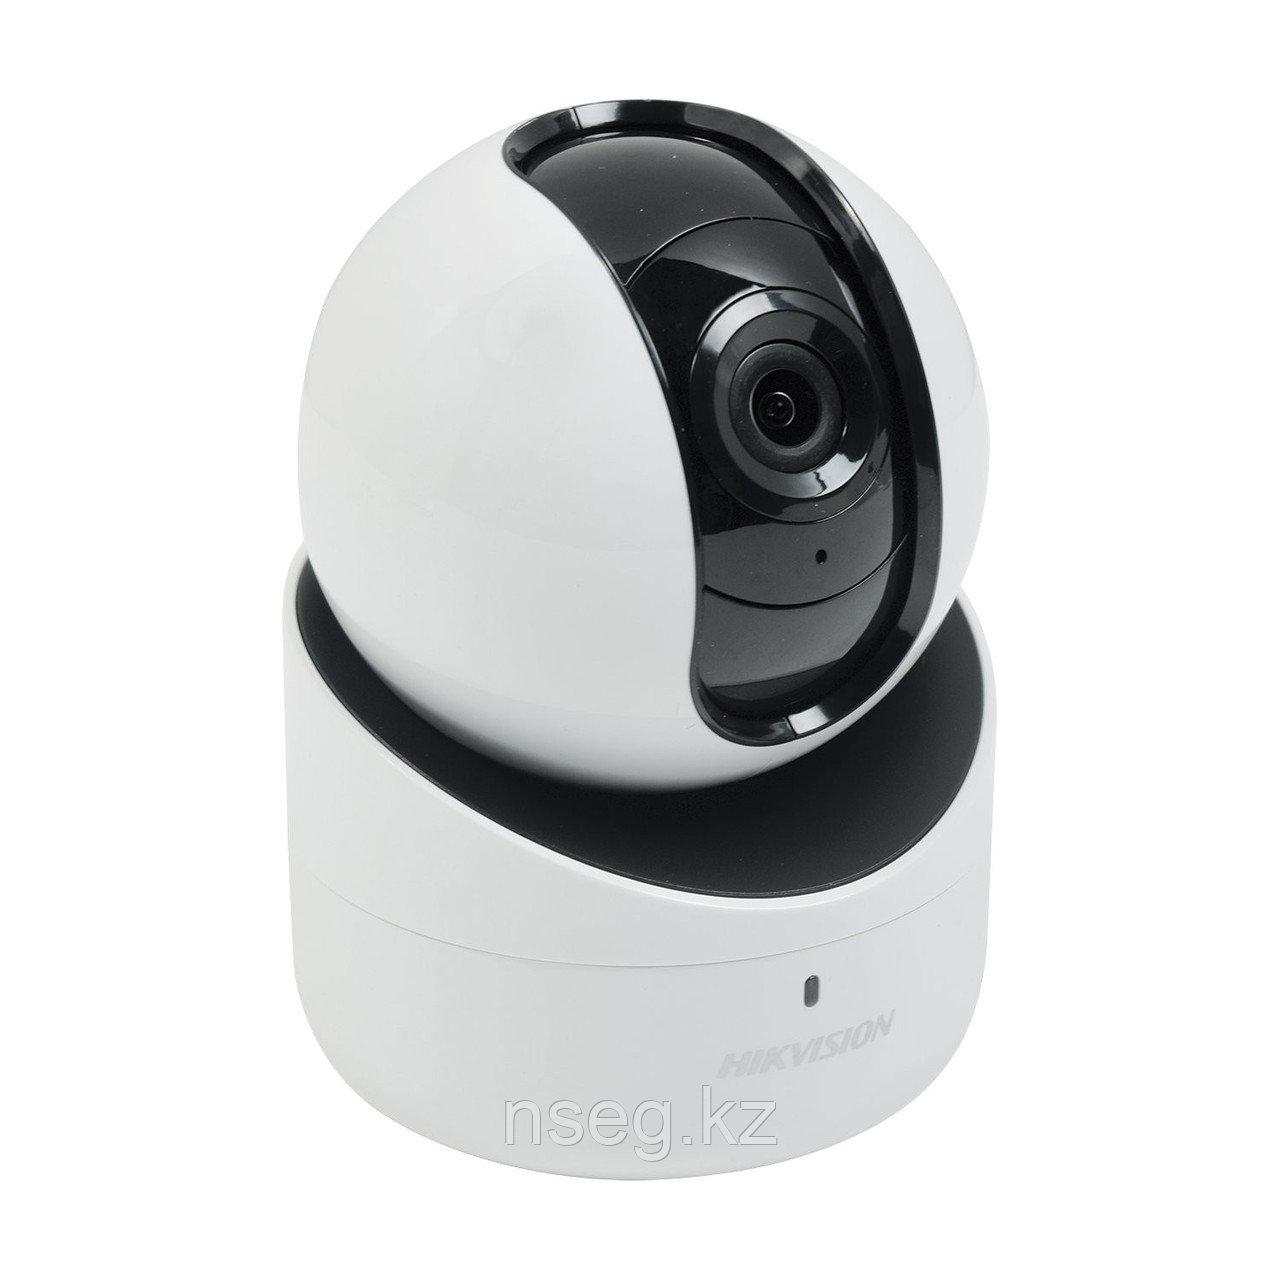 4Мп поворотная IP камера Hikvision DS-2DE7530IW-AE